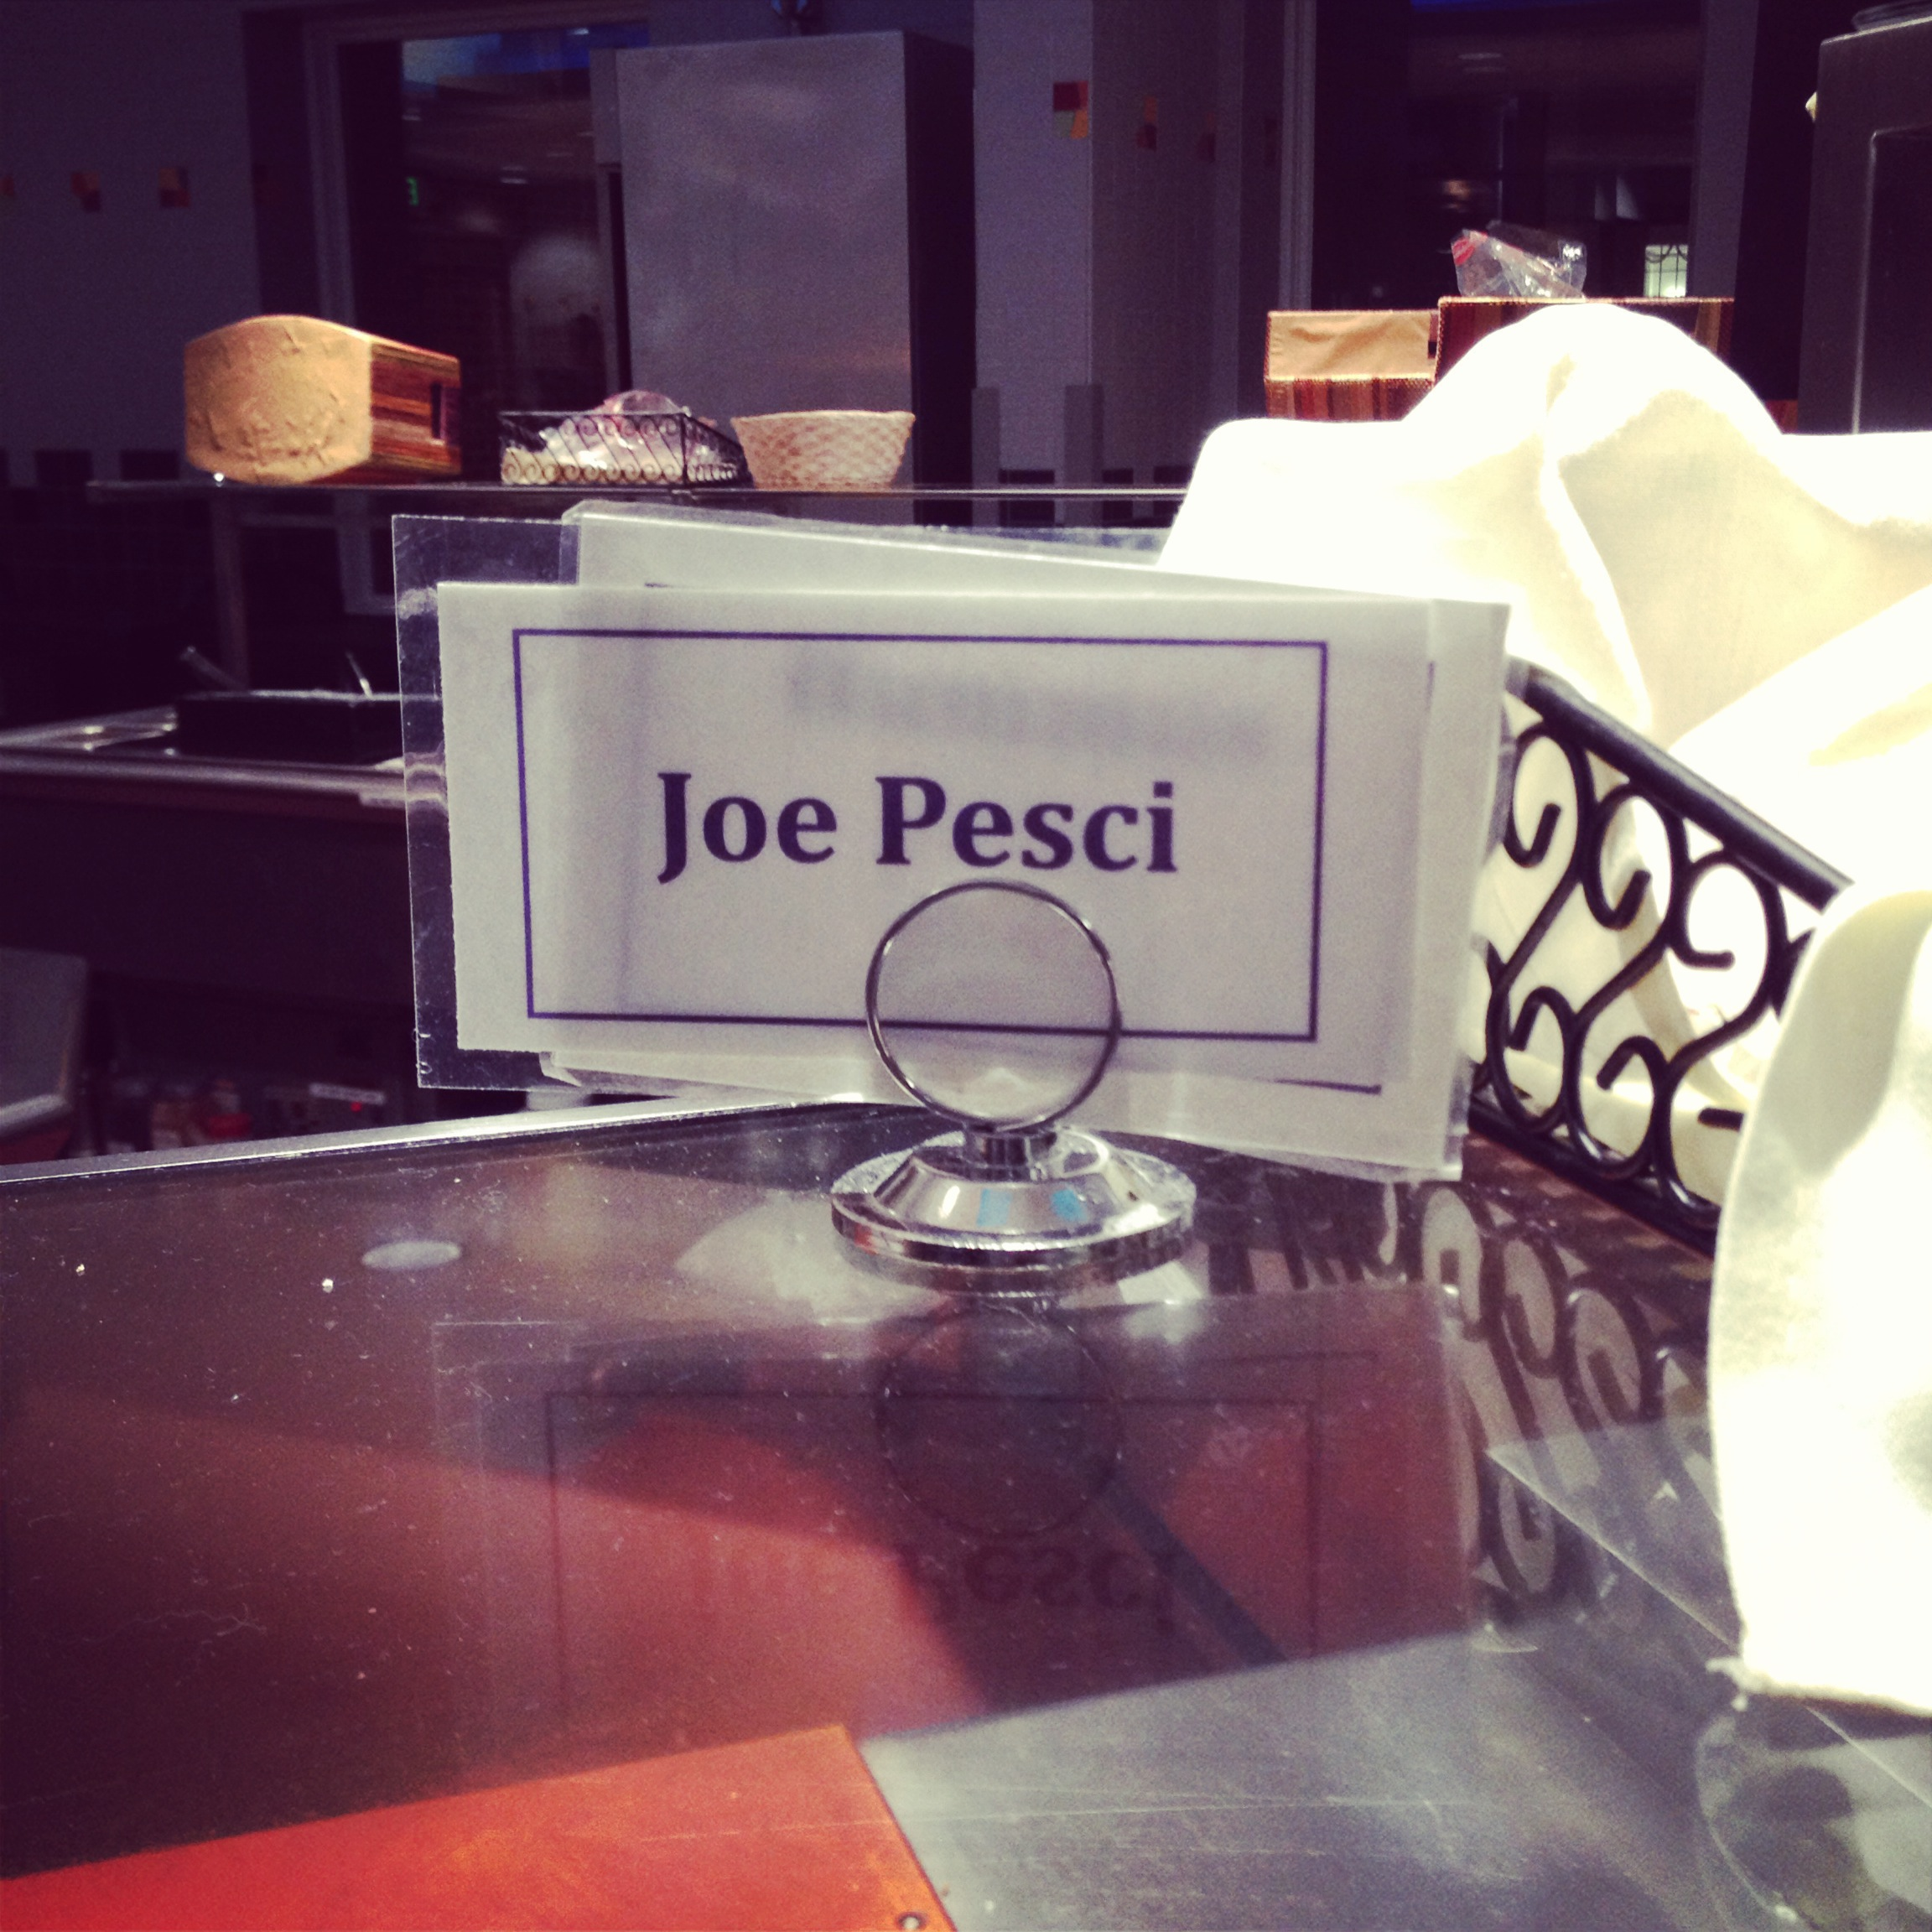 "Joe Pesci,"" one of Val's many popular dinner menu items."